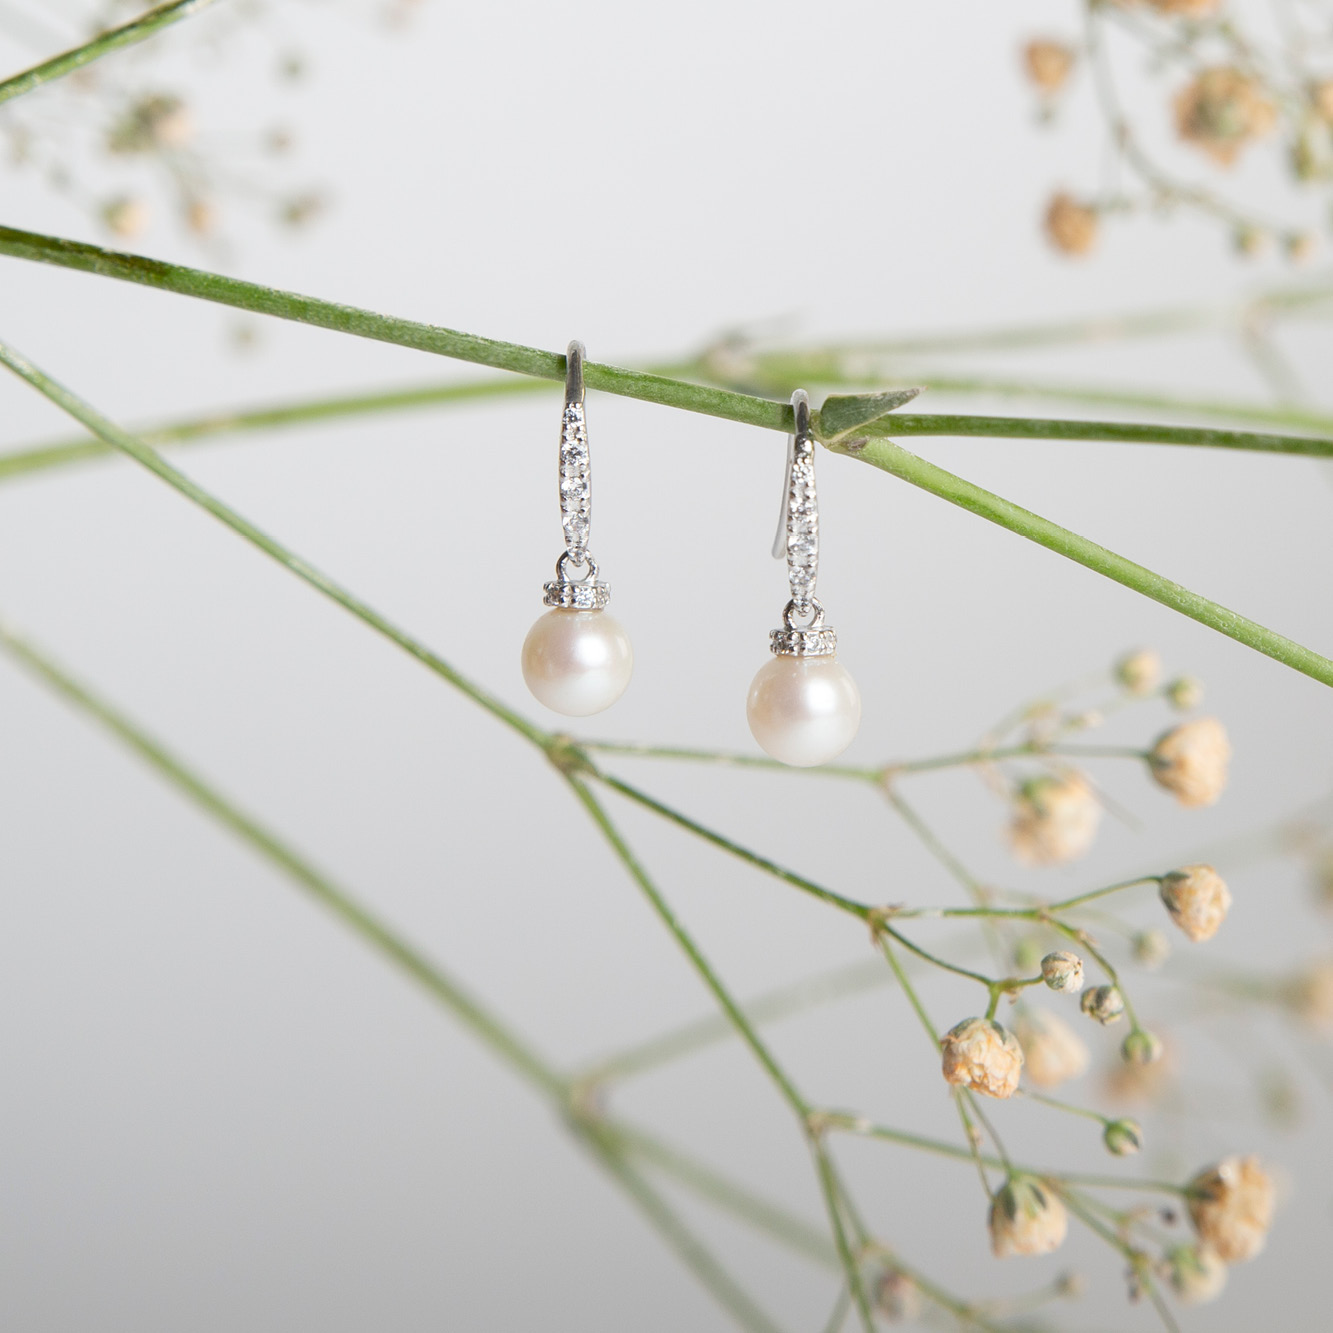 Damen Perlenohrringe Silber 925 Zuchtperlen